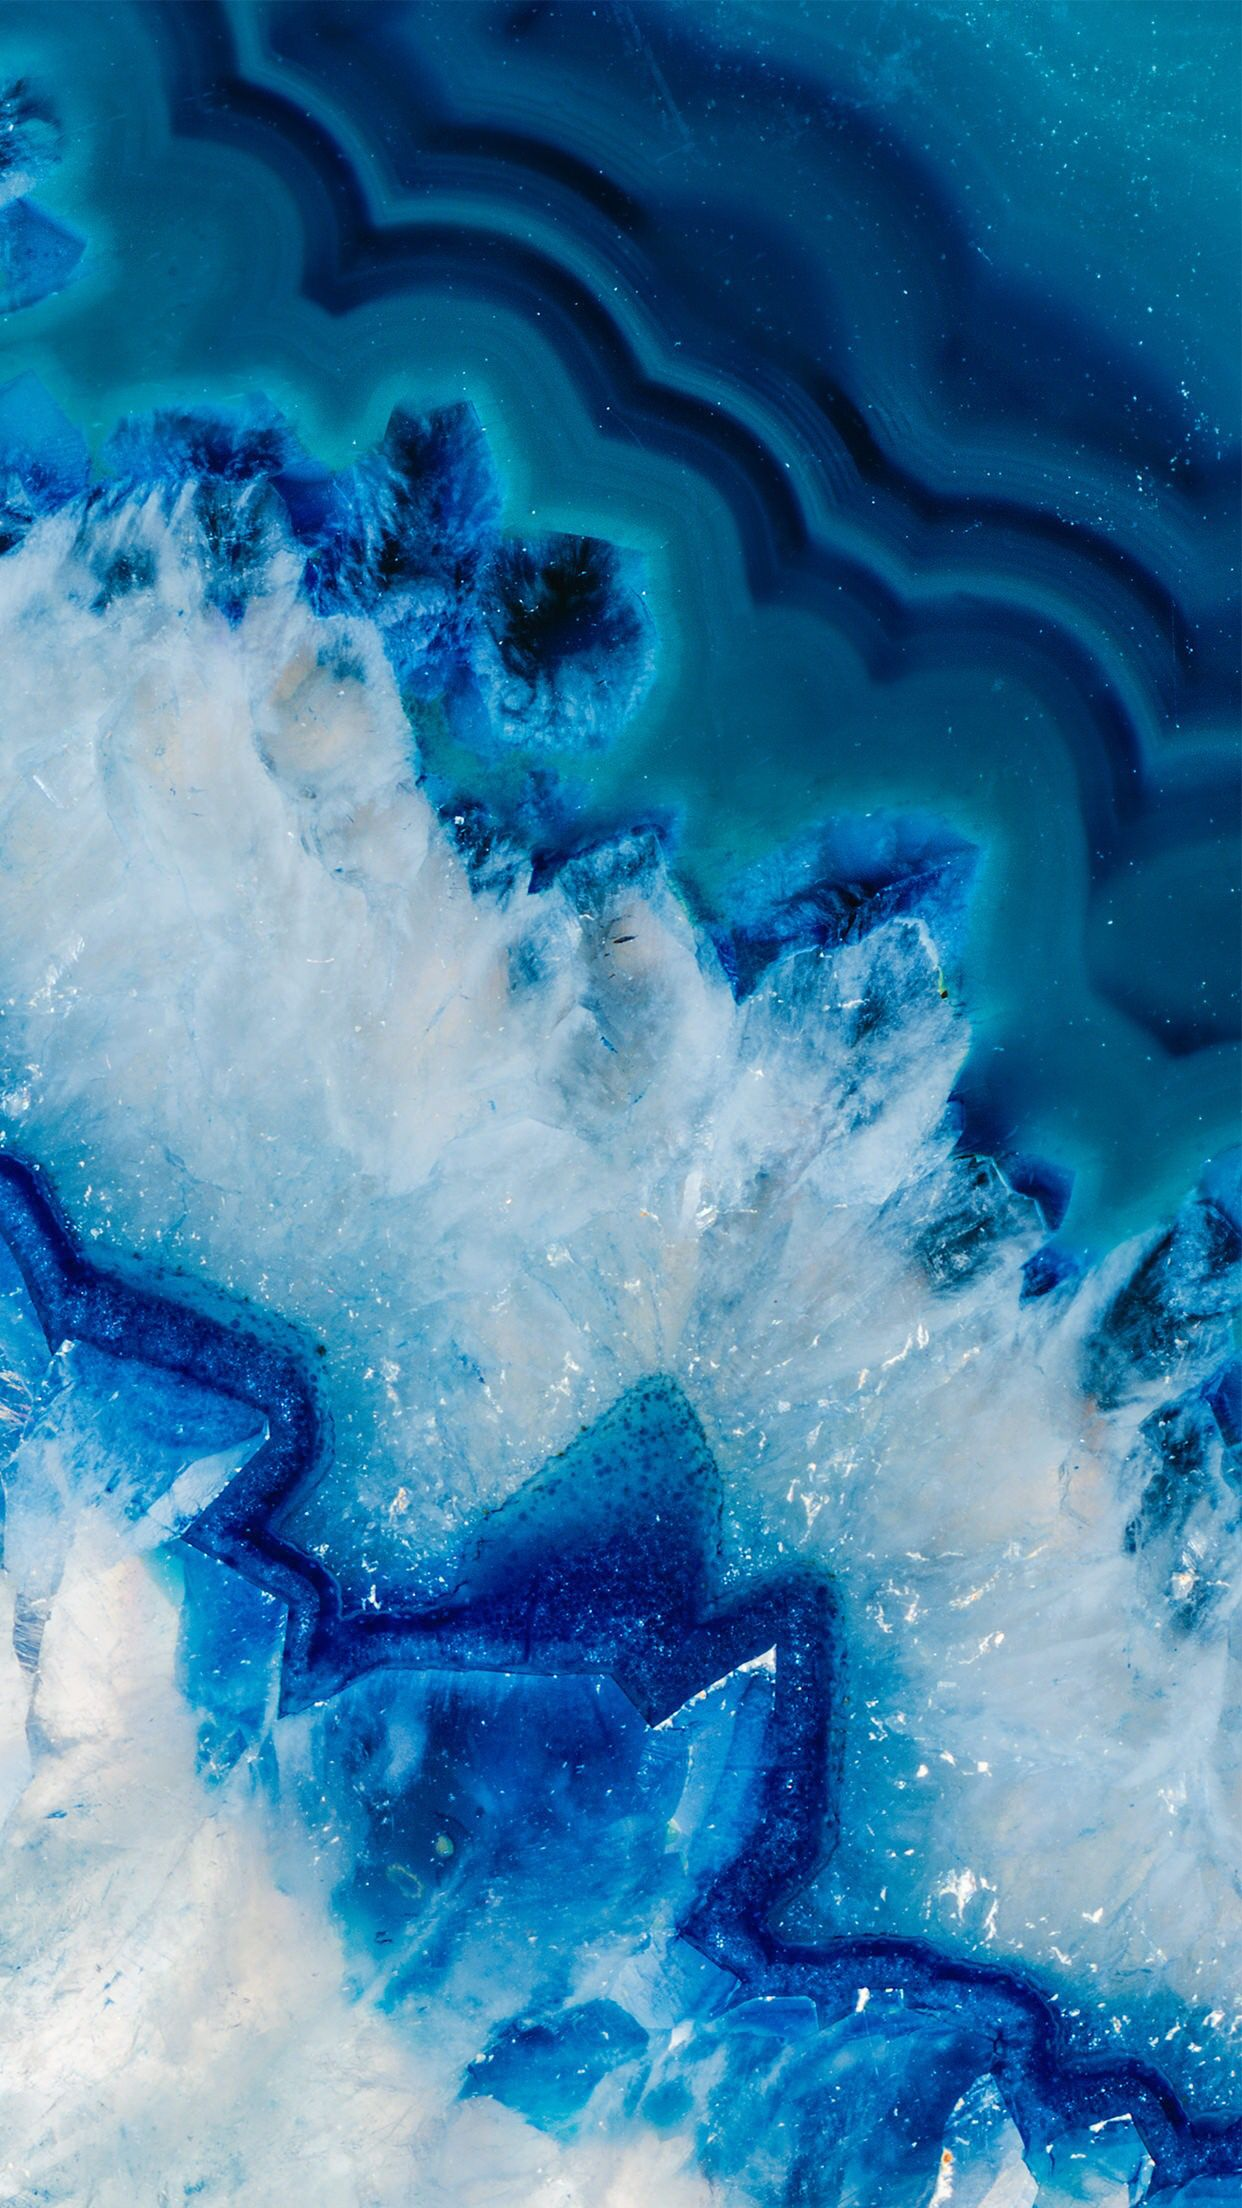 Pin By Brendamoreiraluz On Wallpaper Blue Marble Wallpaper Blue Wallpaper Iphone Marble Iphone Wallpaper